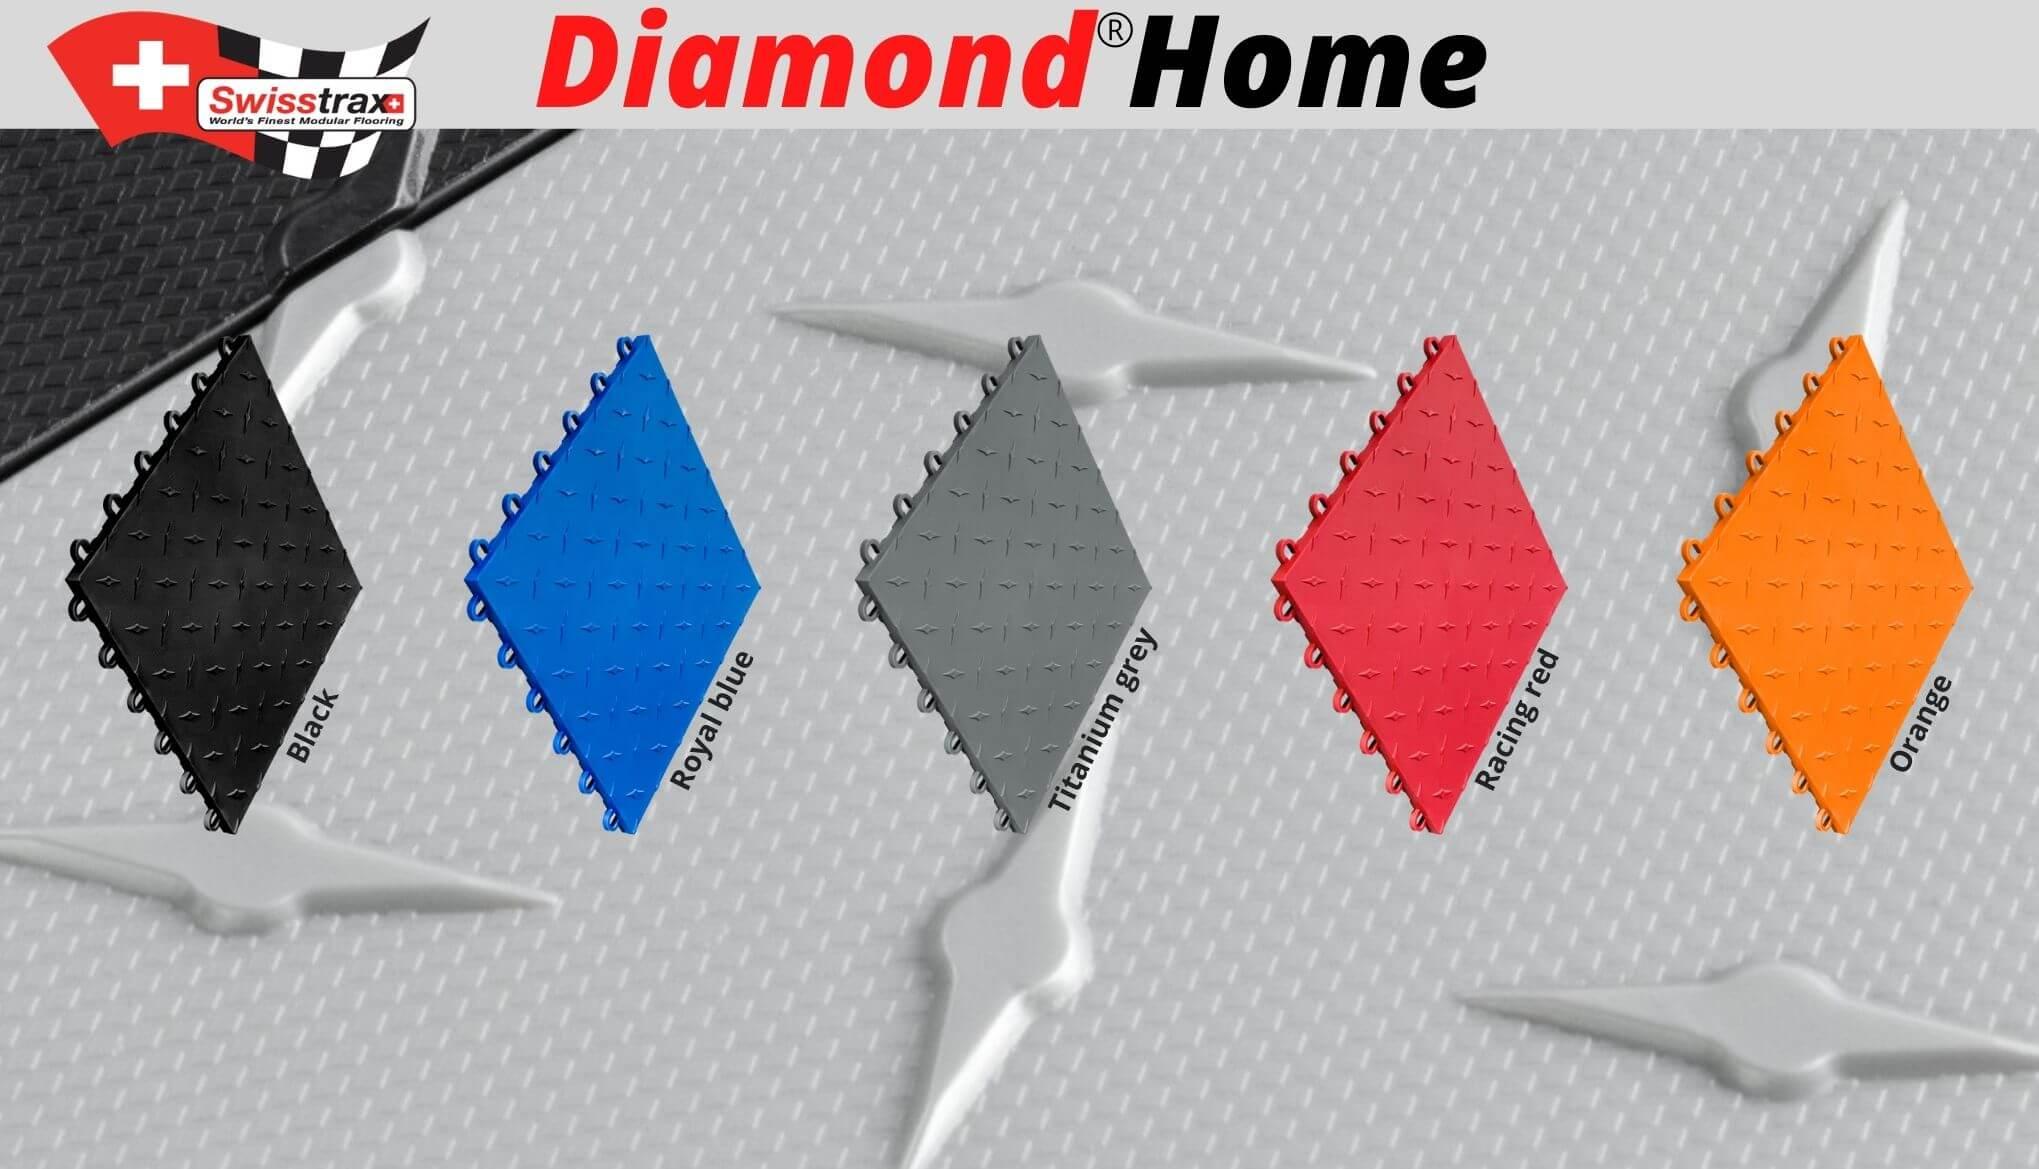 diamond home colors